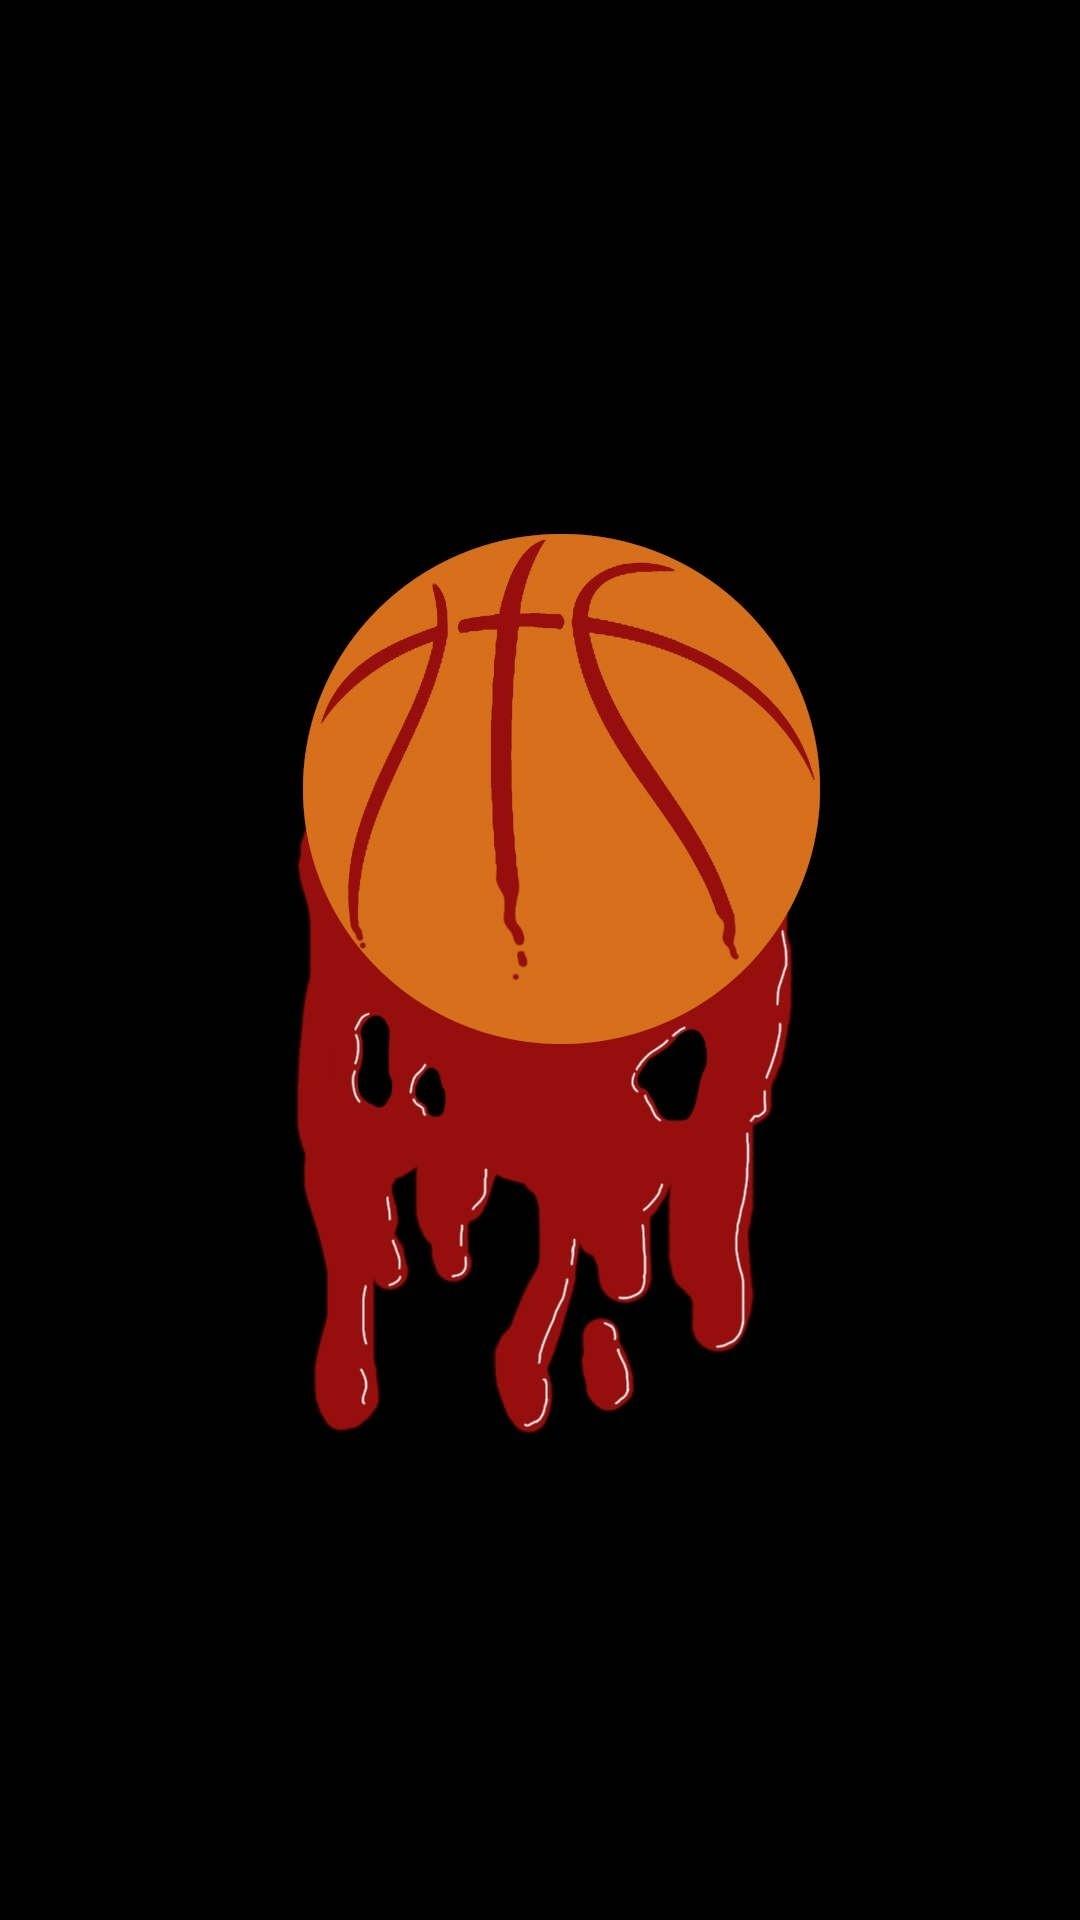 Basketball phone wallpaper